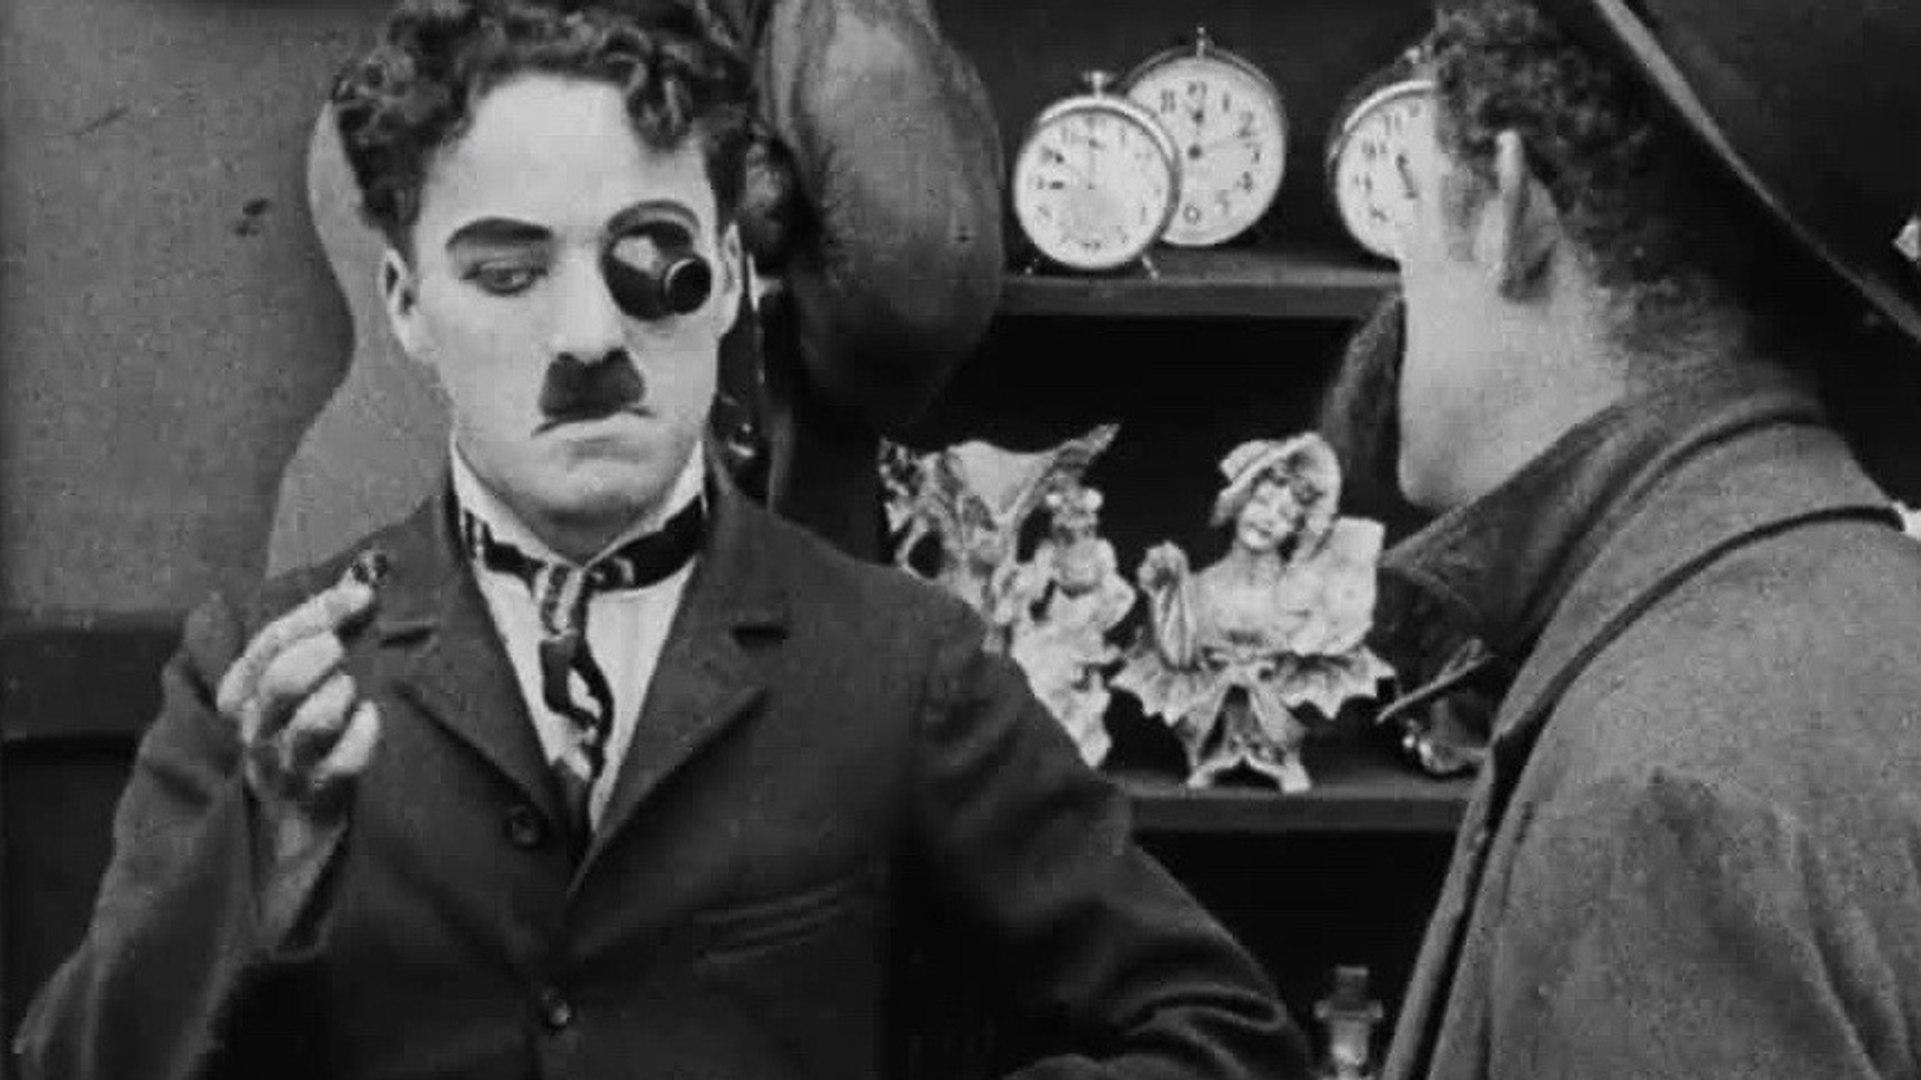 The Pawnshop (1916) Charles Chaplin, Henry Bergman, Edna Purviance.  Comedy, Short